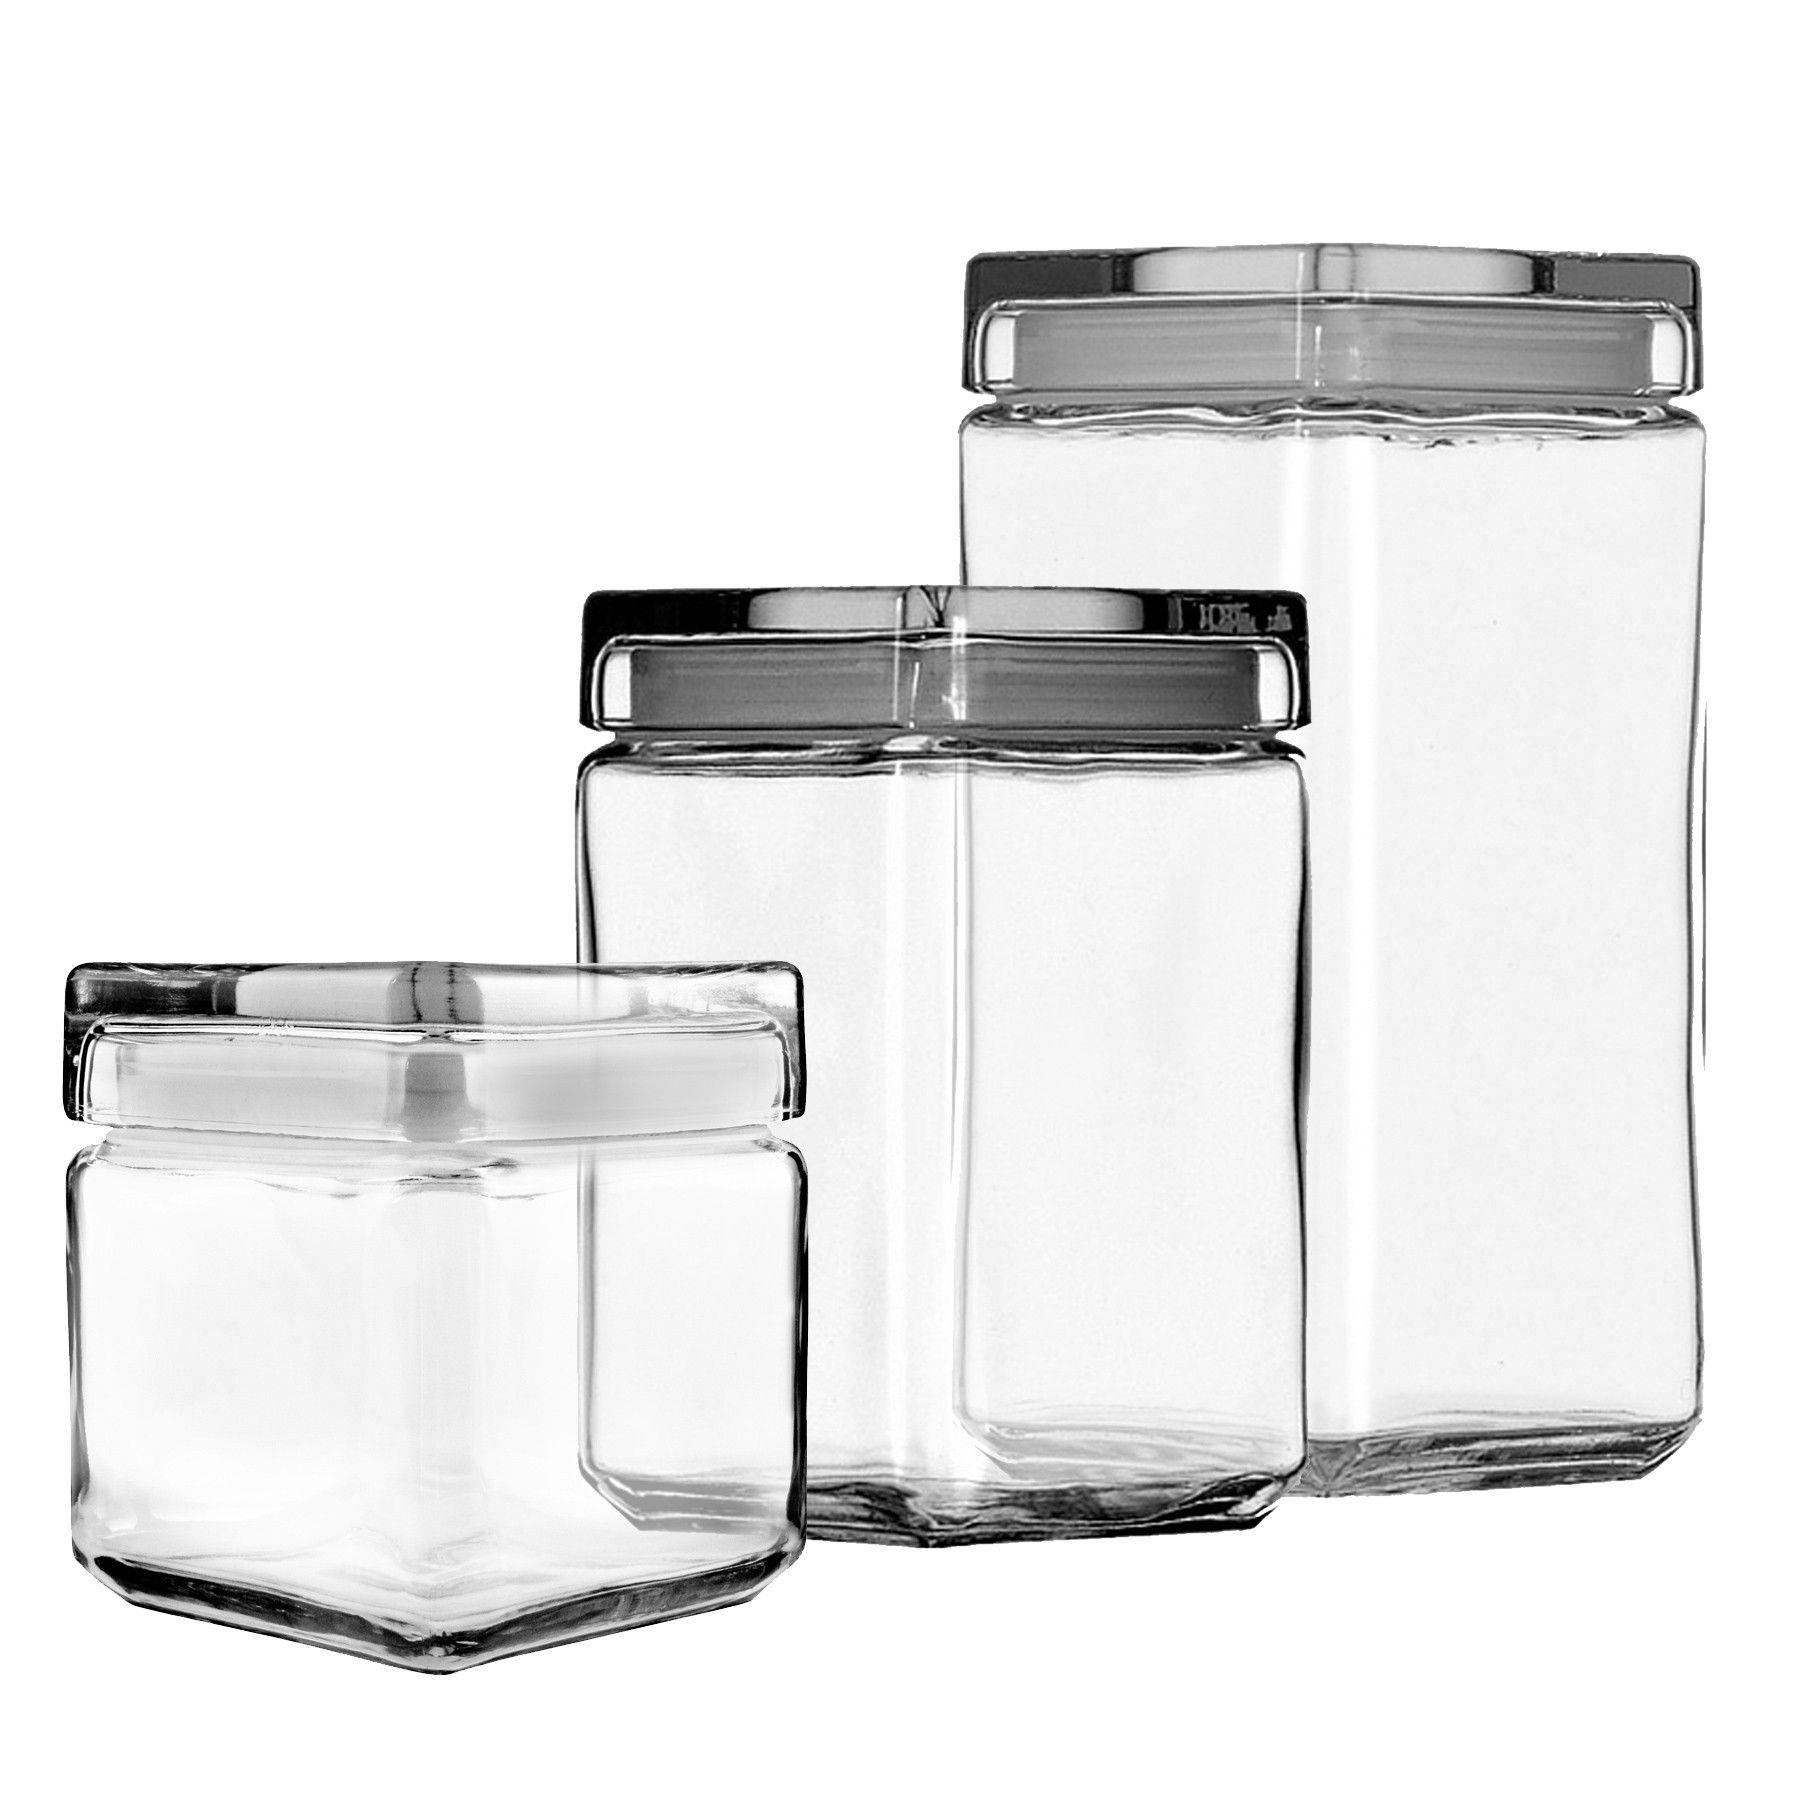 Marvelous Anchor Hocking Stackable Glass Jars Set Of 3 W/ Glass Lid   Glass Jars,  Vases U0026 Canisters   Jars U0026 Canisters   Storage U0026 Organization